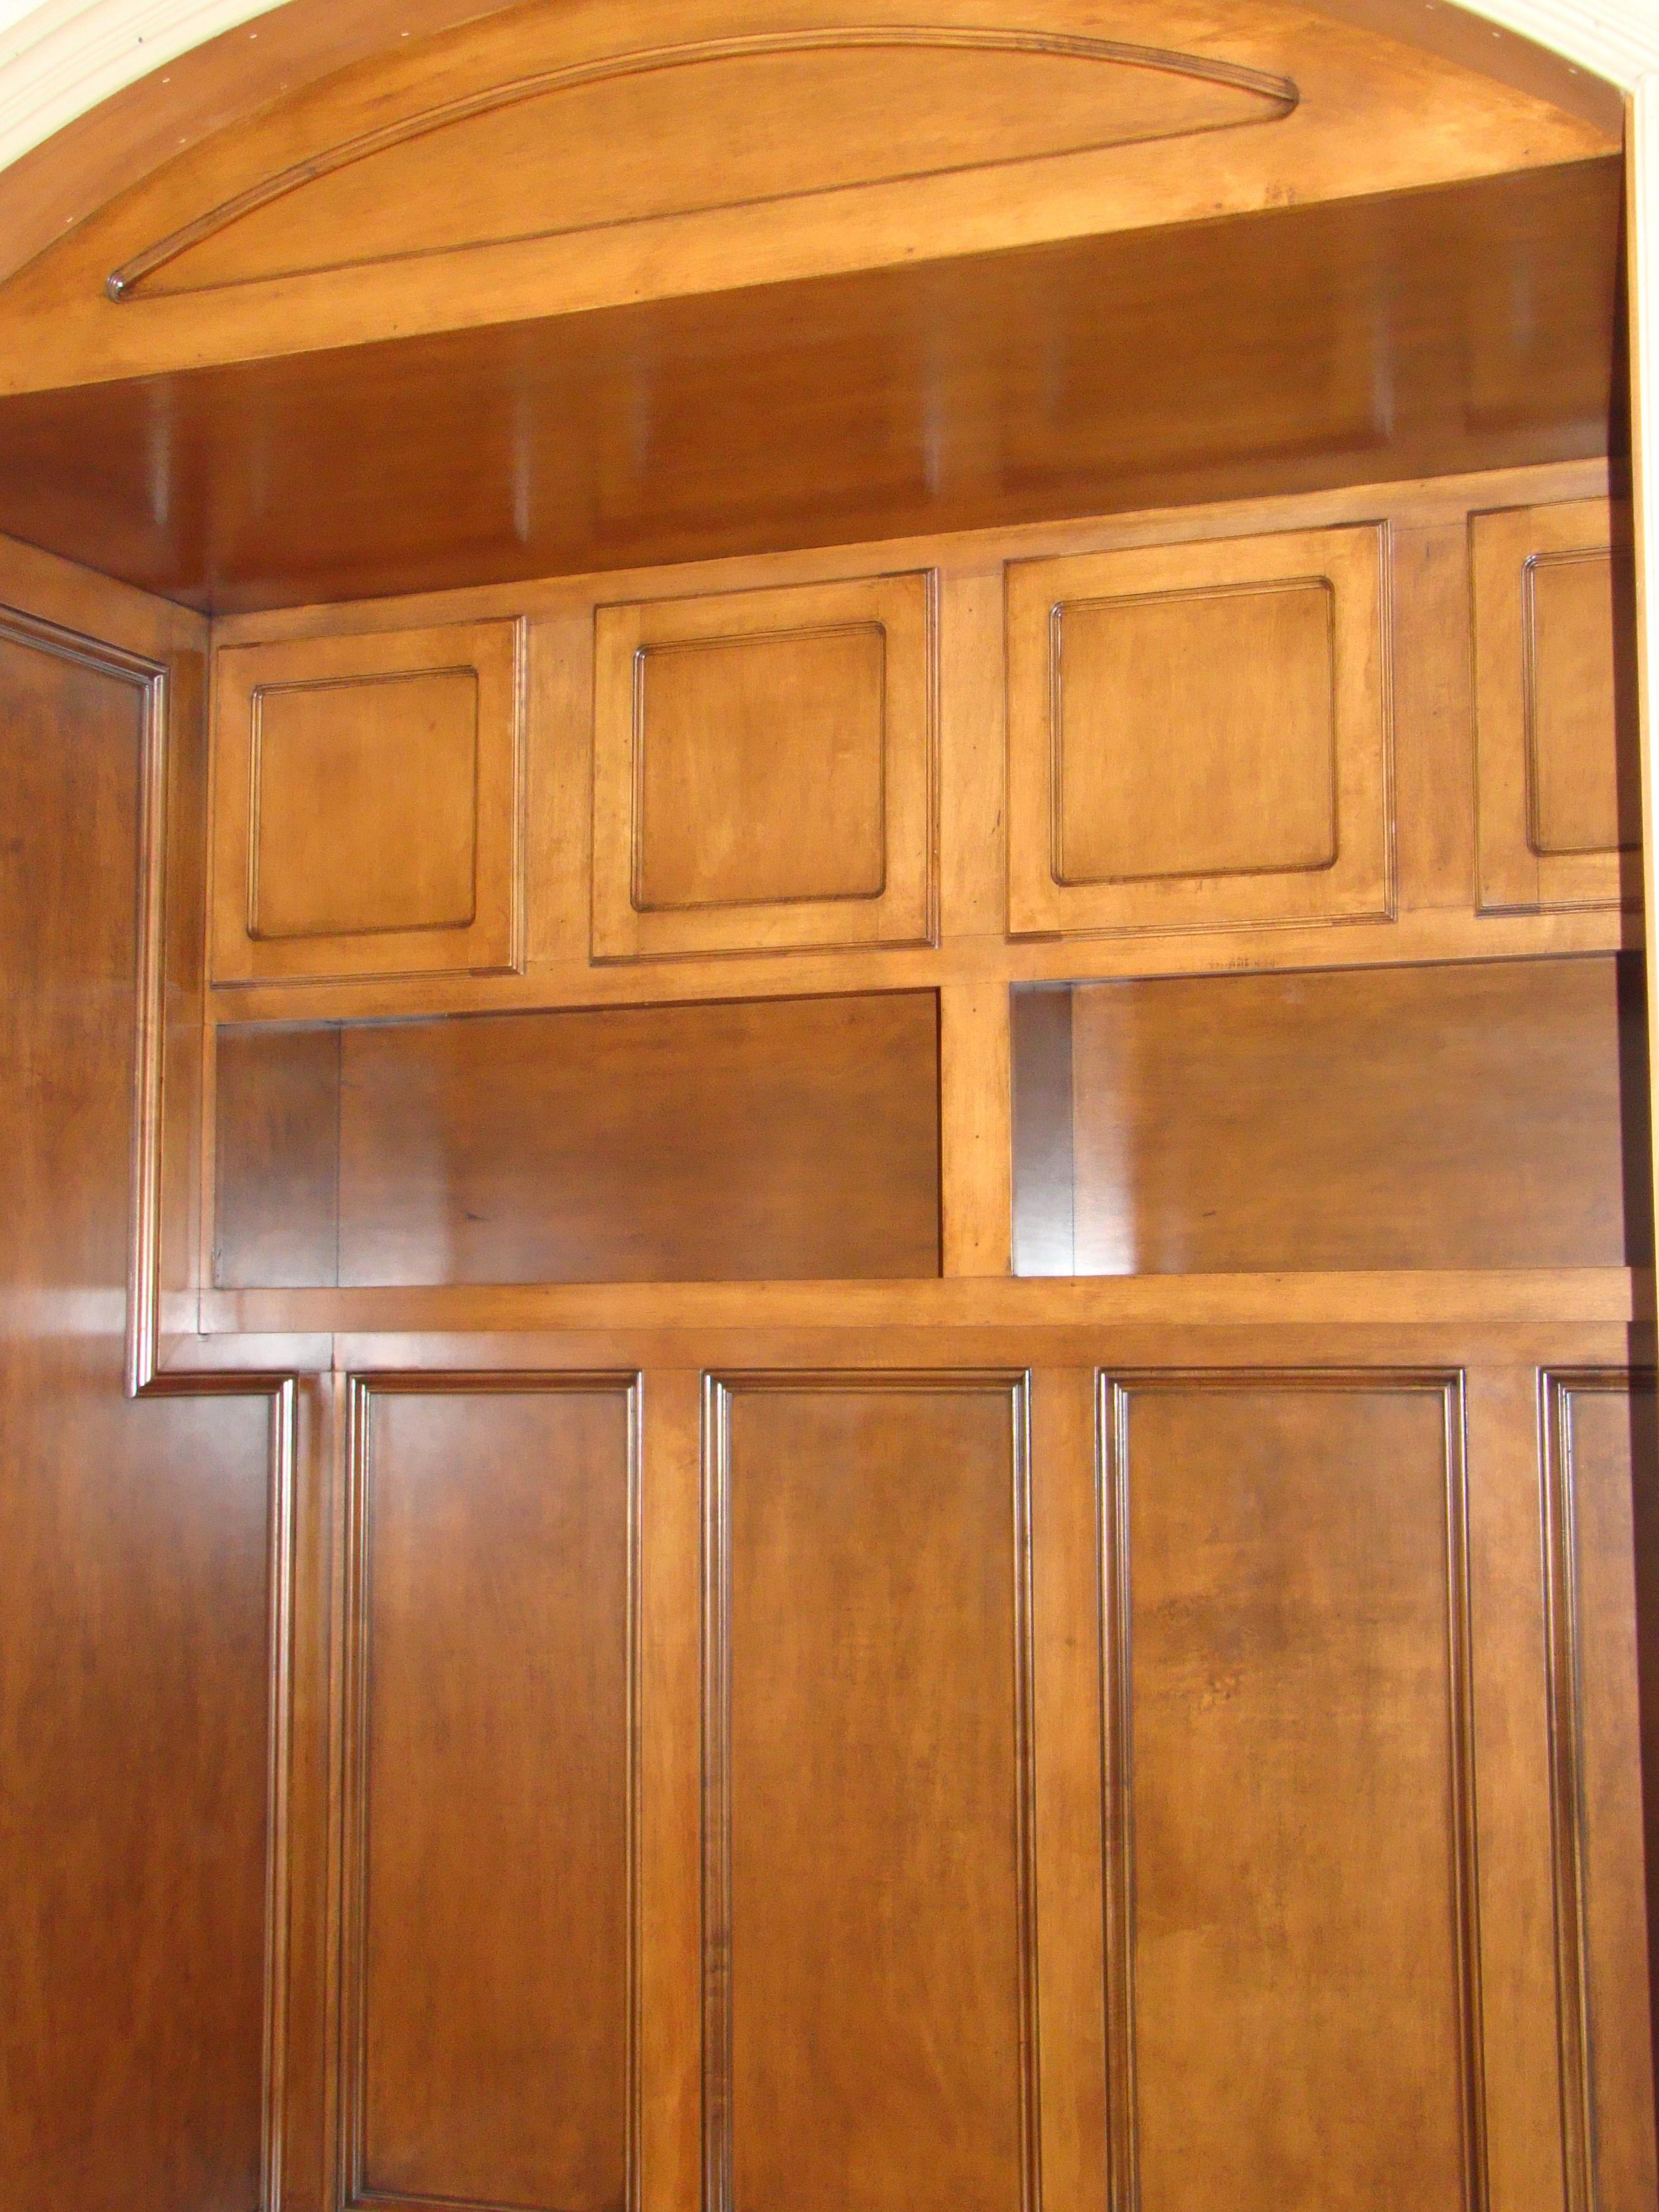 Mud Room Paneled Seat with Storage, Lights and Hooks